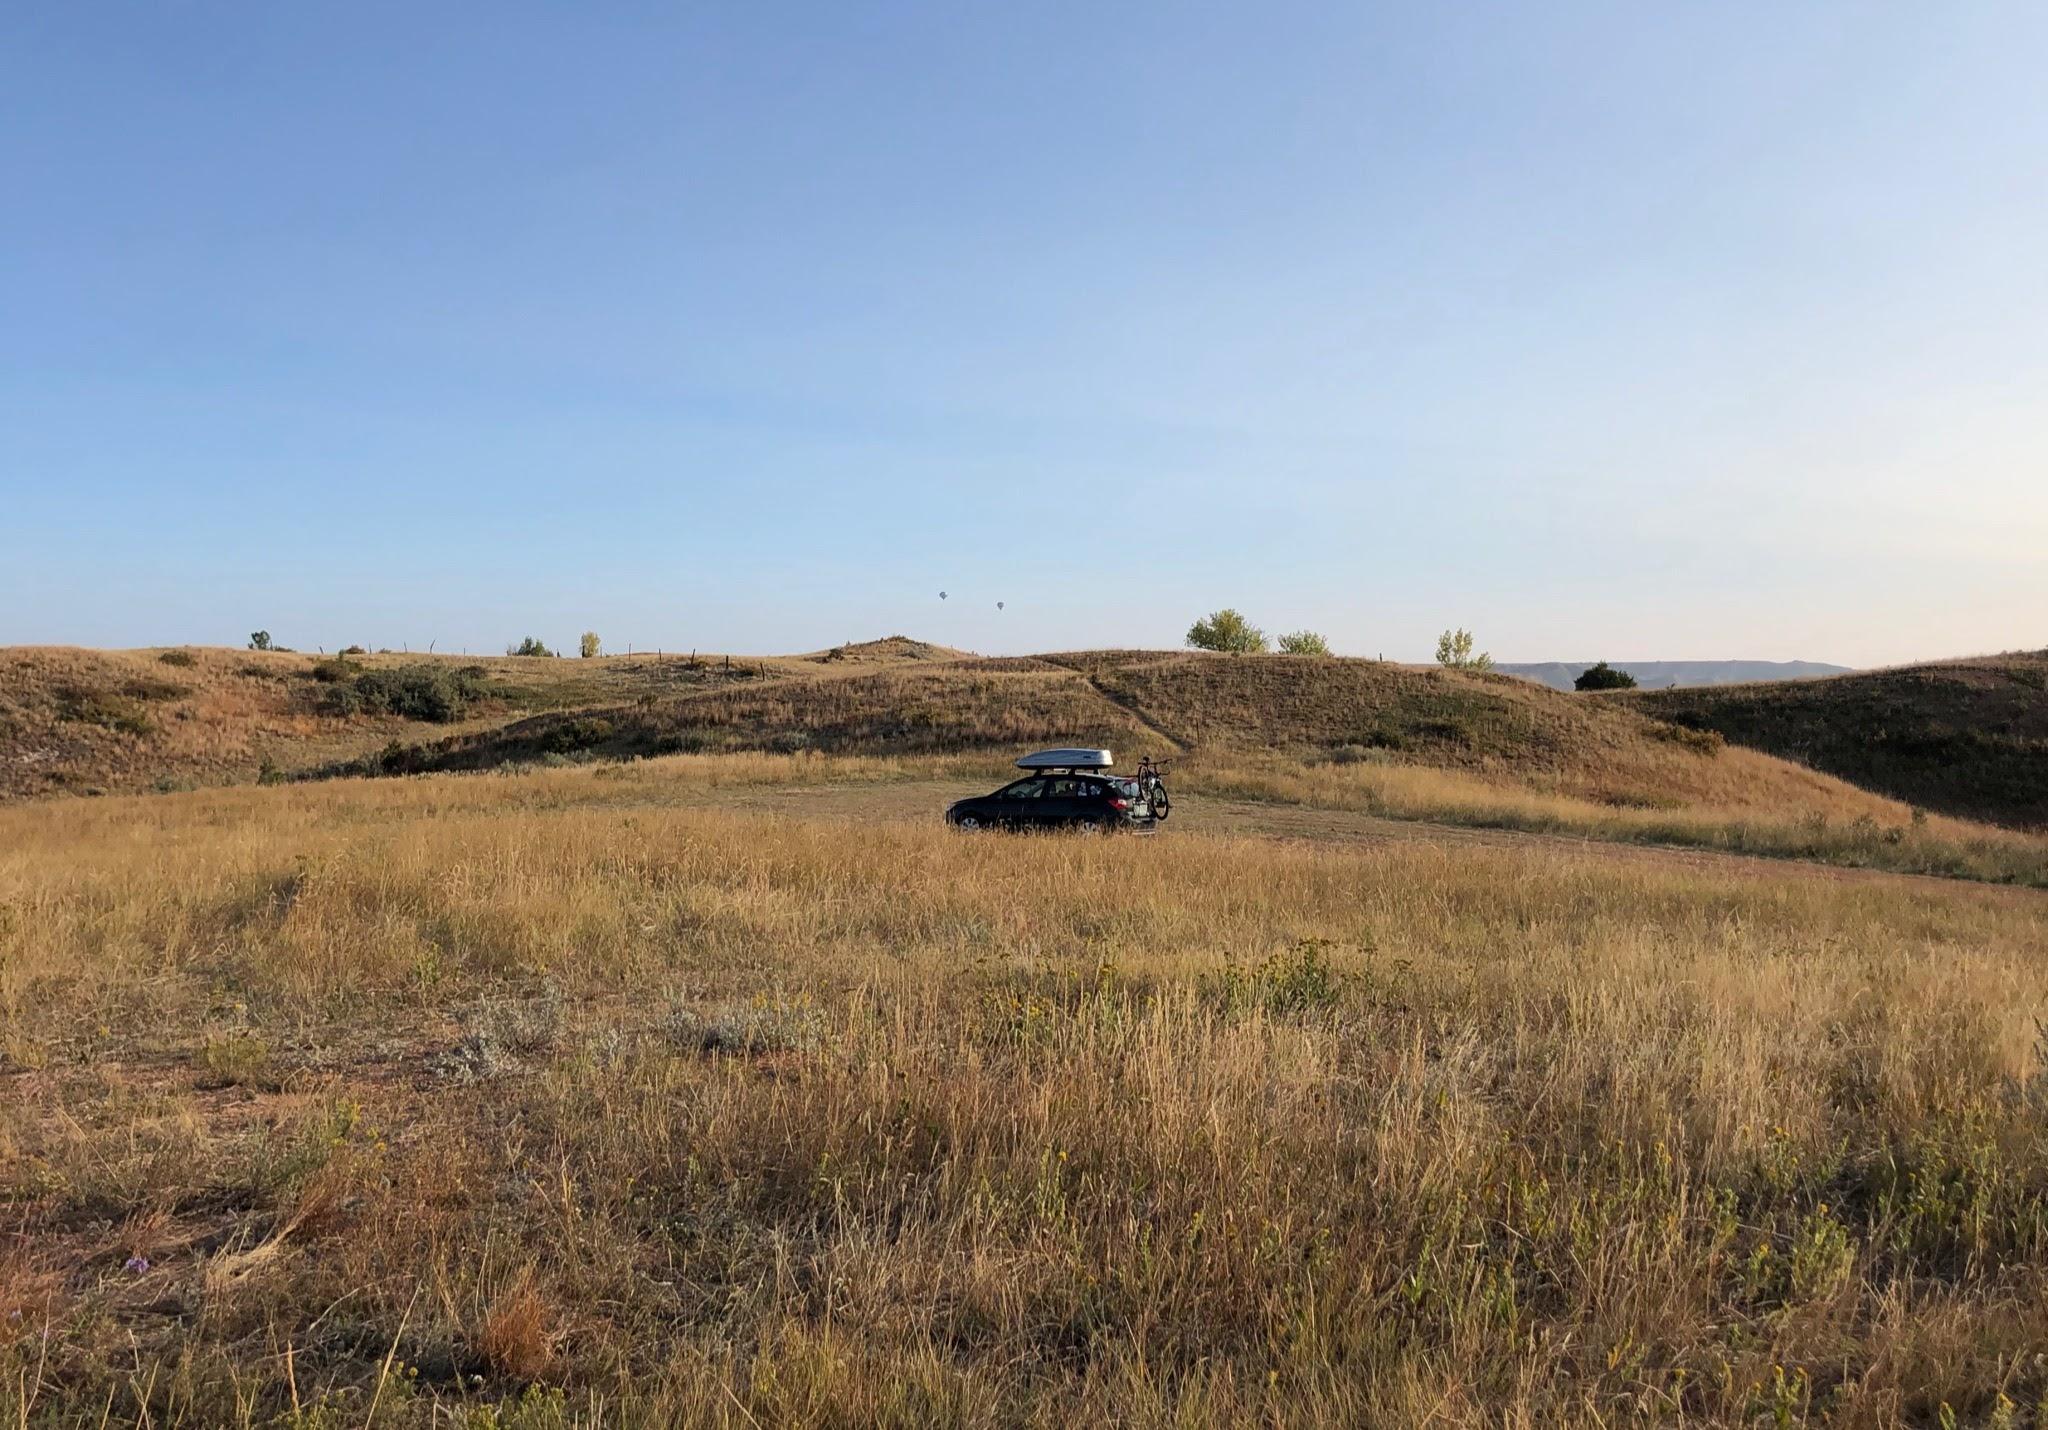 The author's Subaru Impreza parked amidst rolling fields